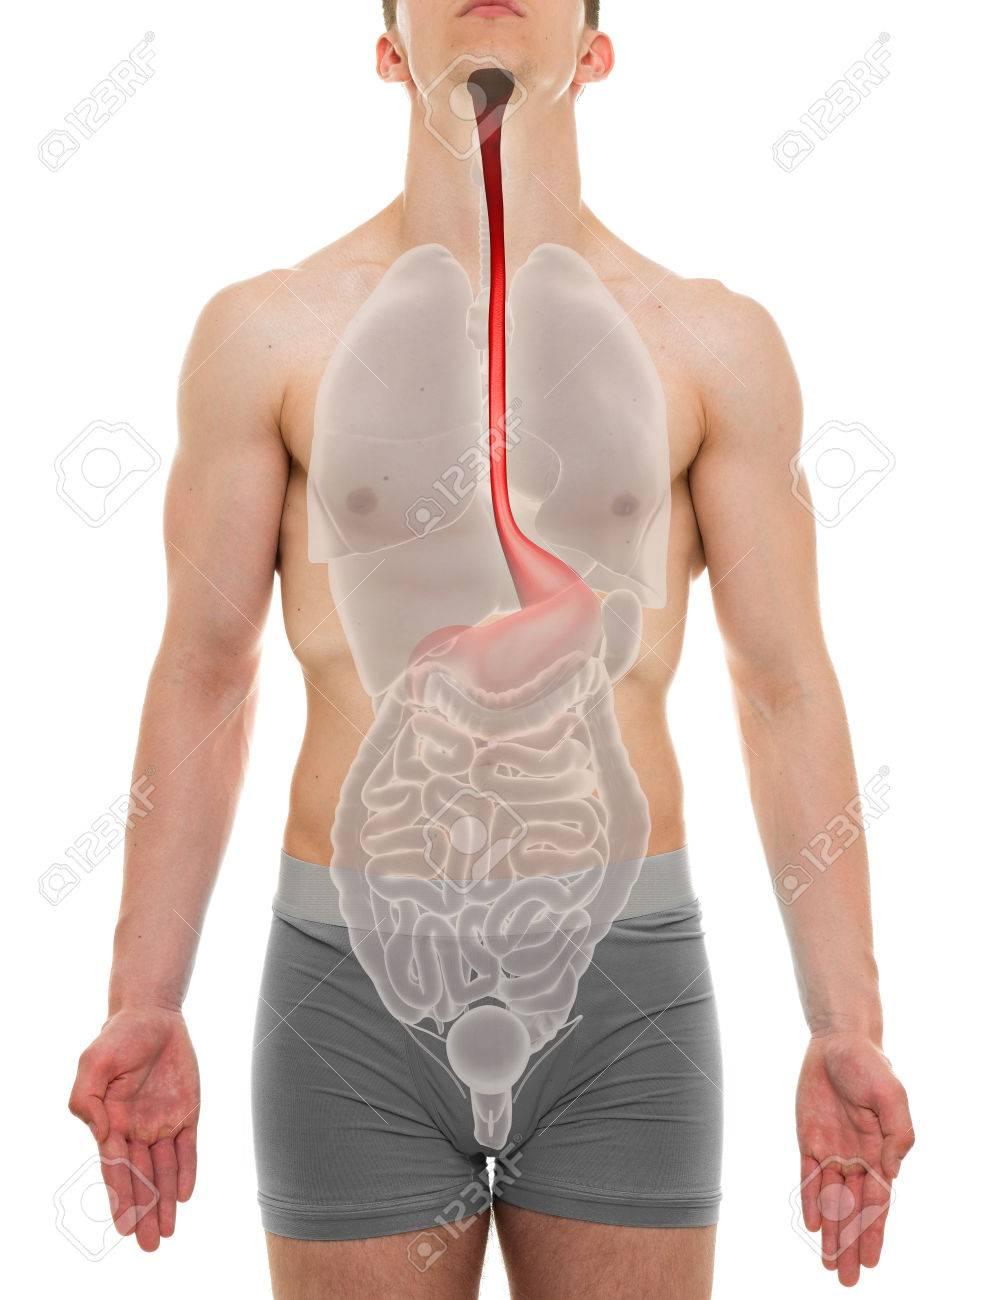 Esophagus Male Internal Organs Anatomy 3d Illustration Stock